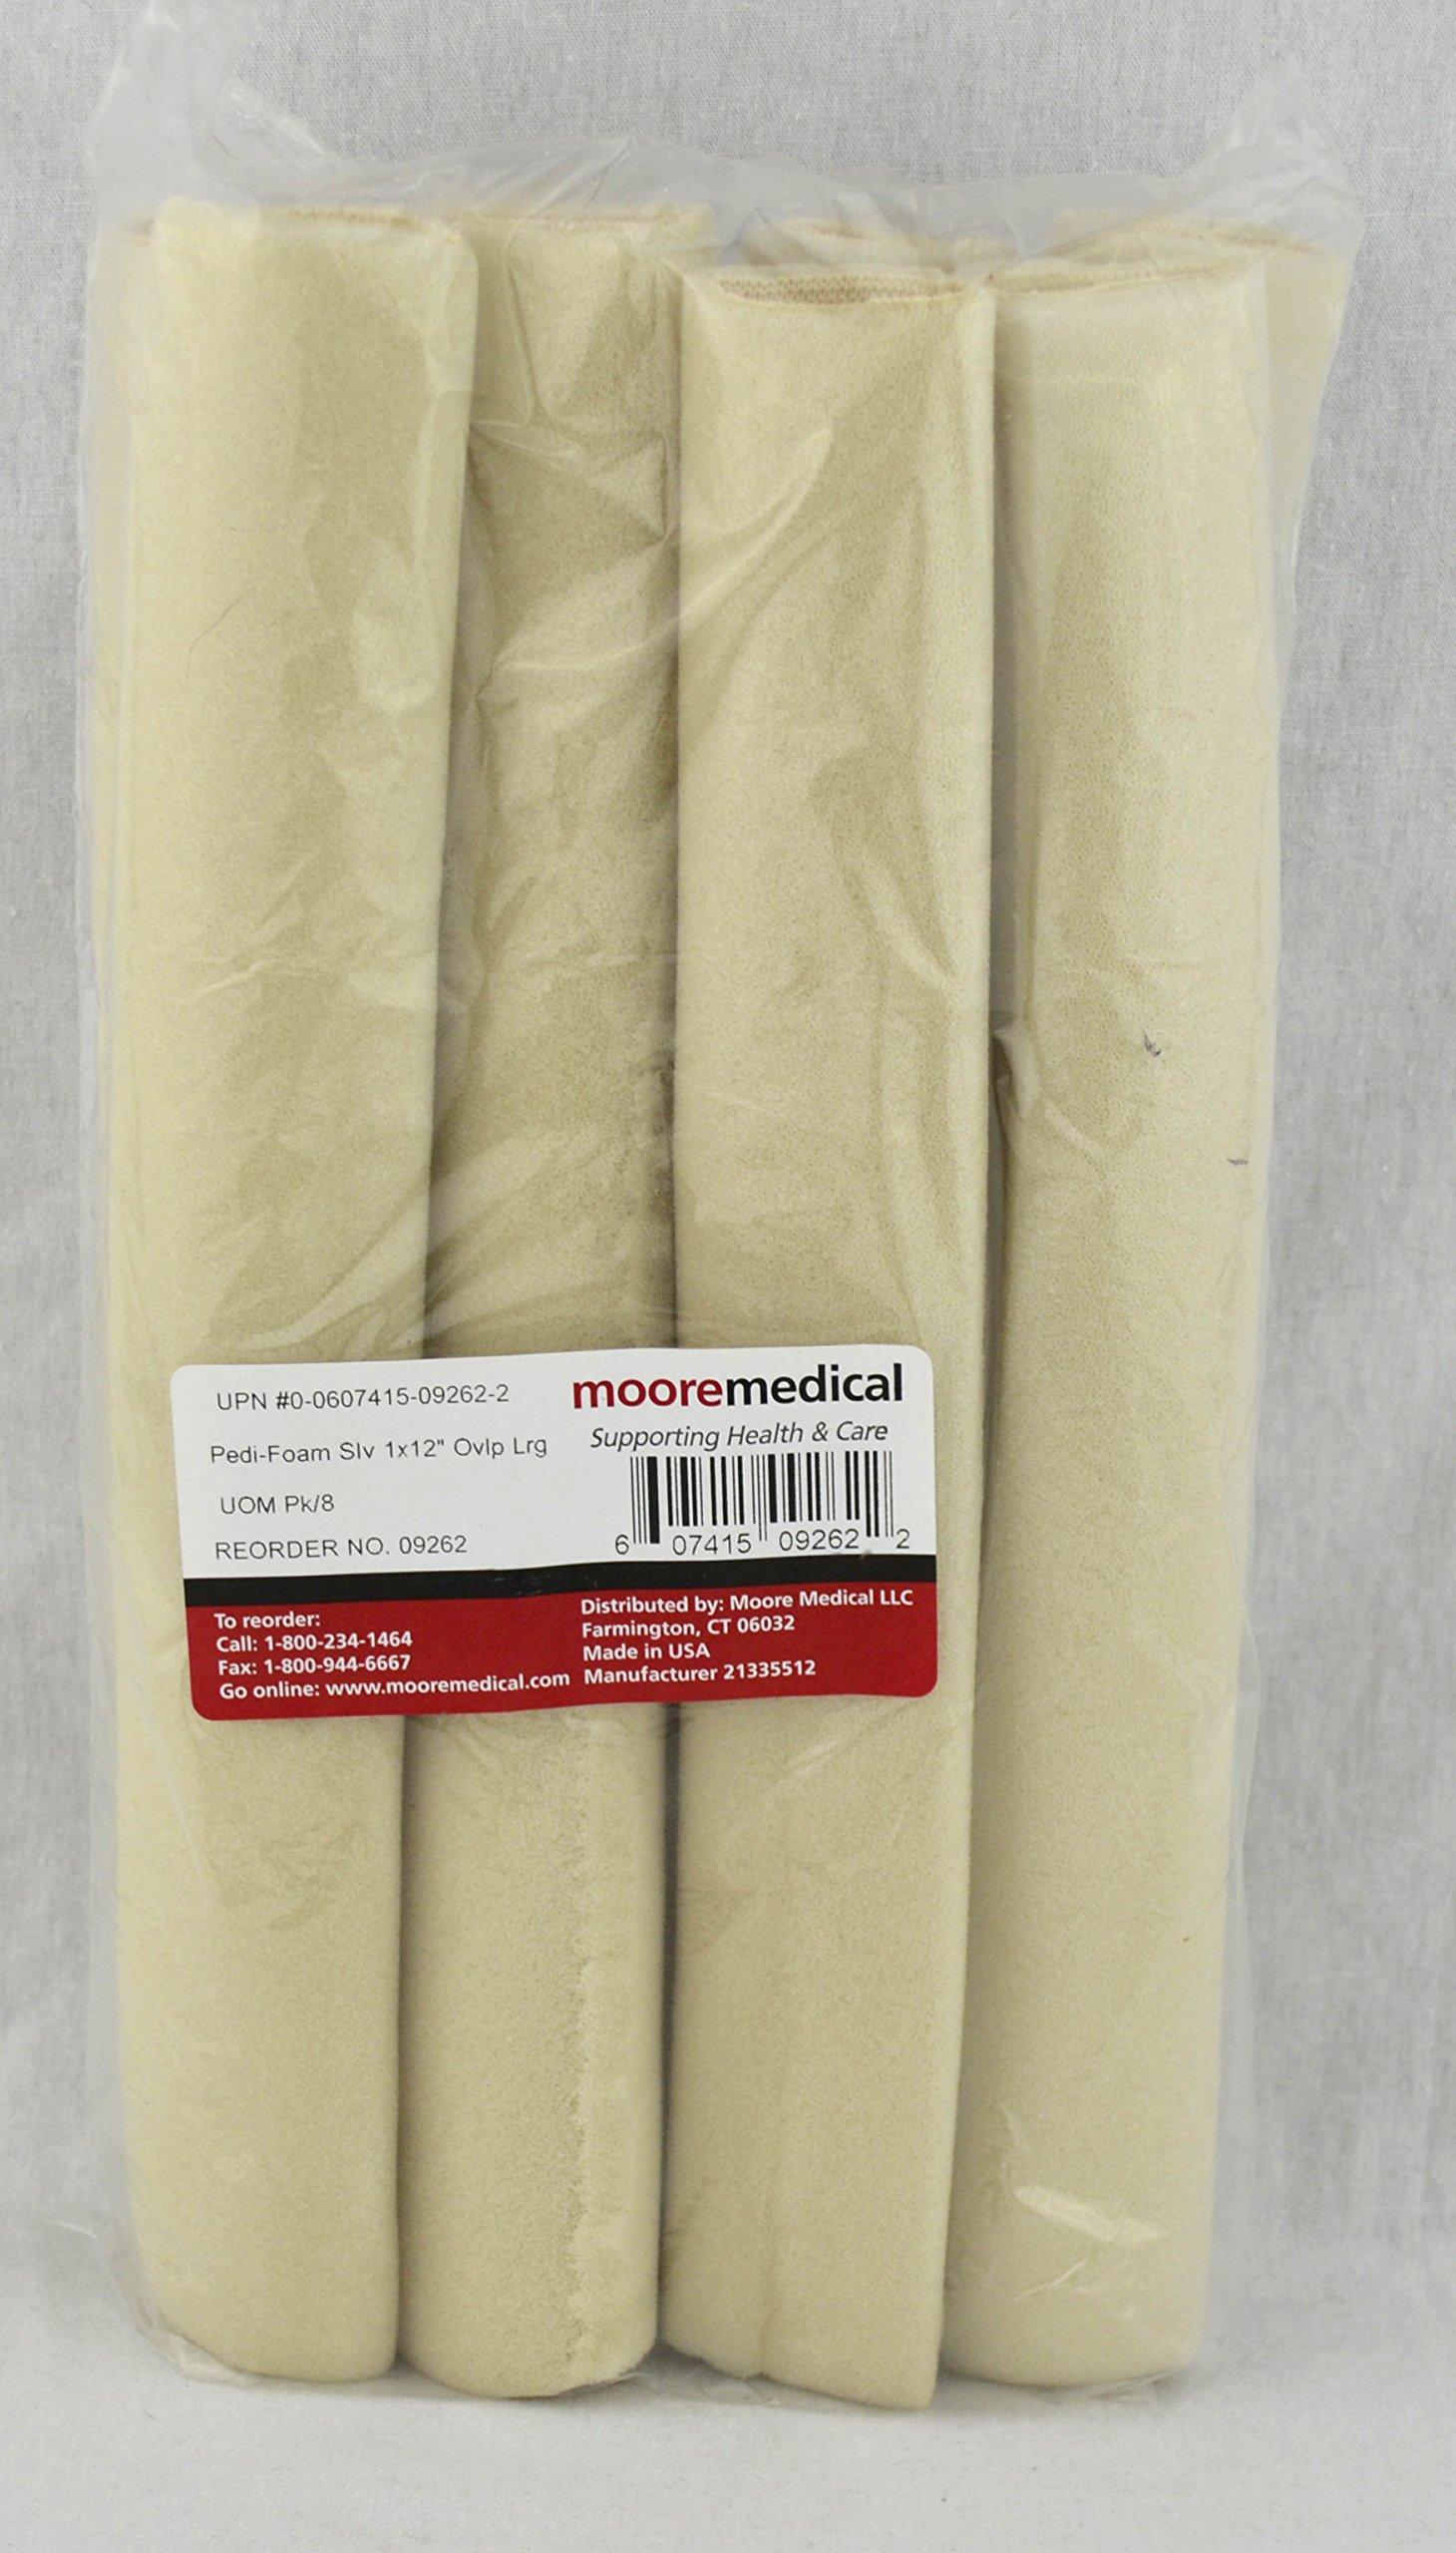 Moore Medical Pedi-foam Sleeves #6 Overlap Large 1''